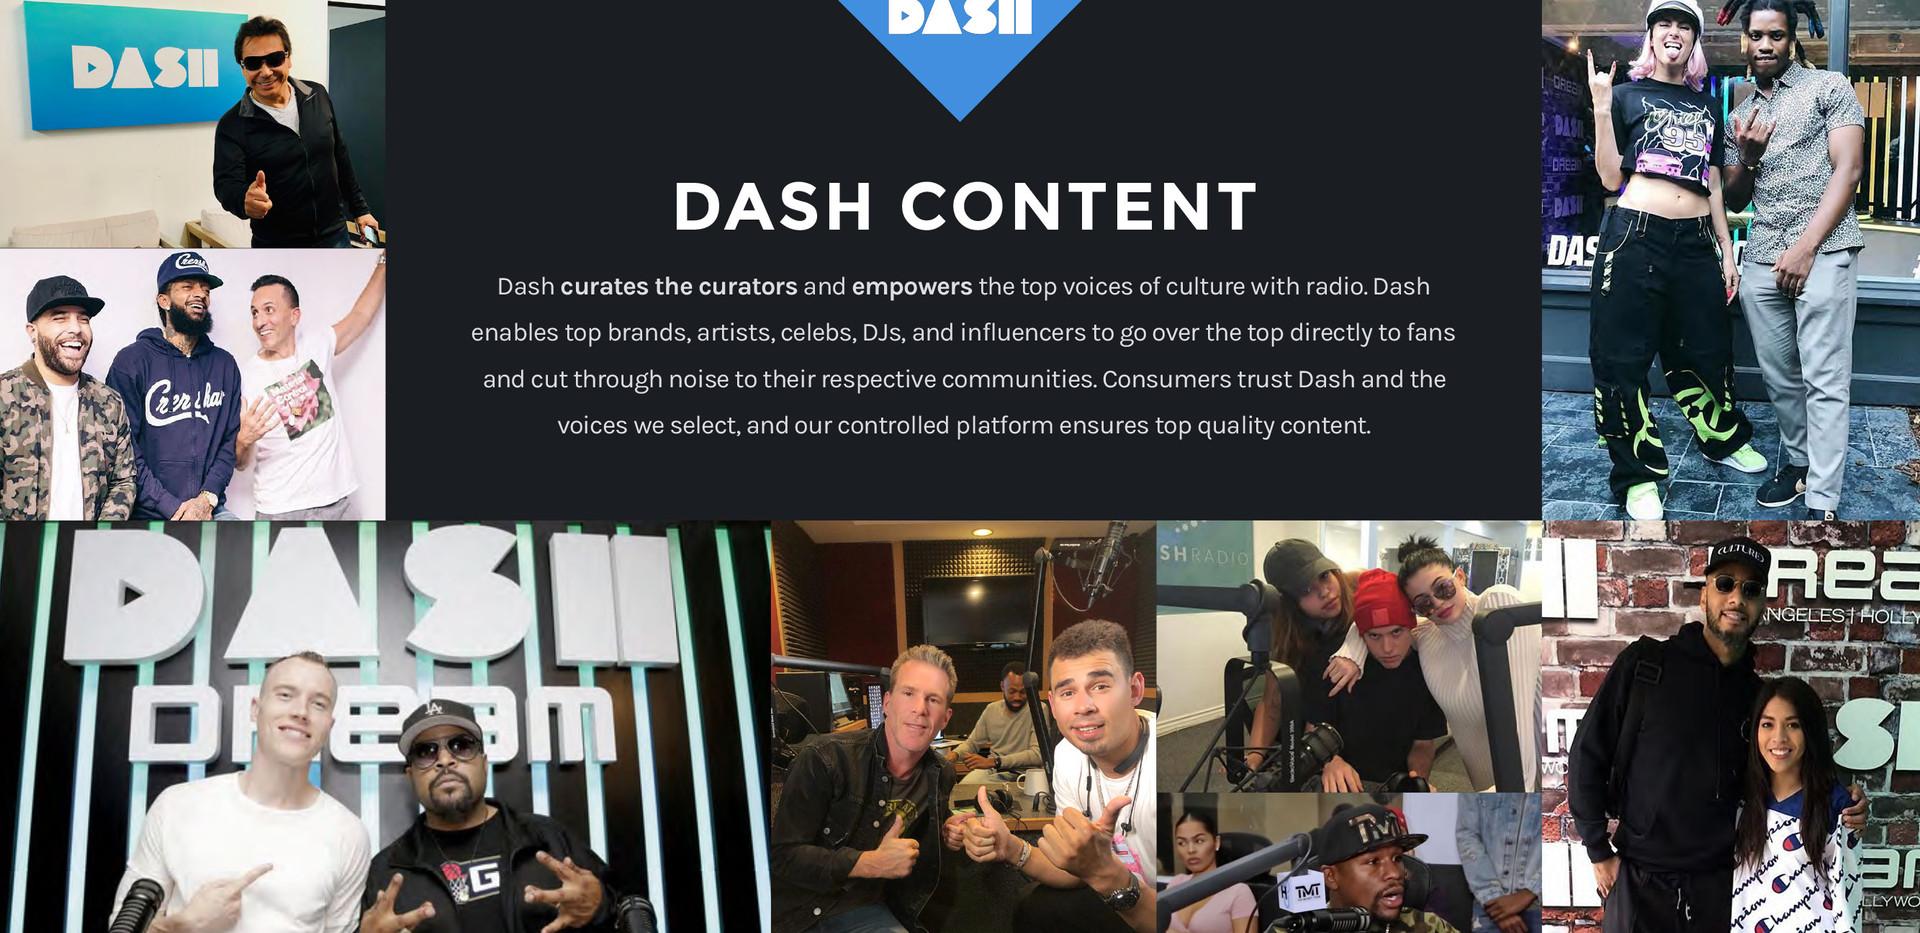 Dash-Deck-2018-6.jpg